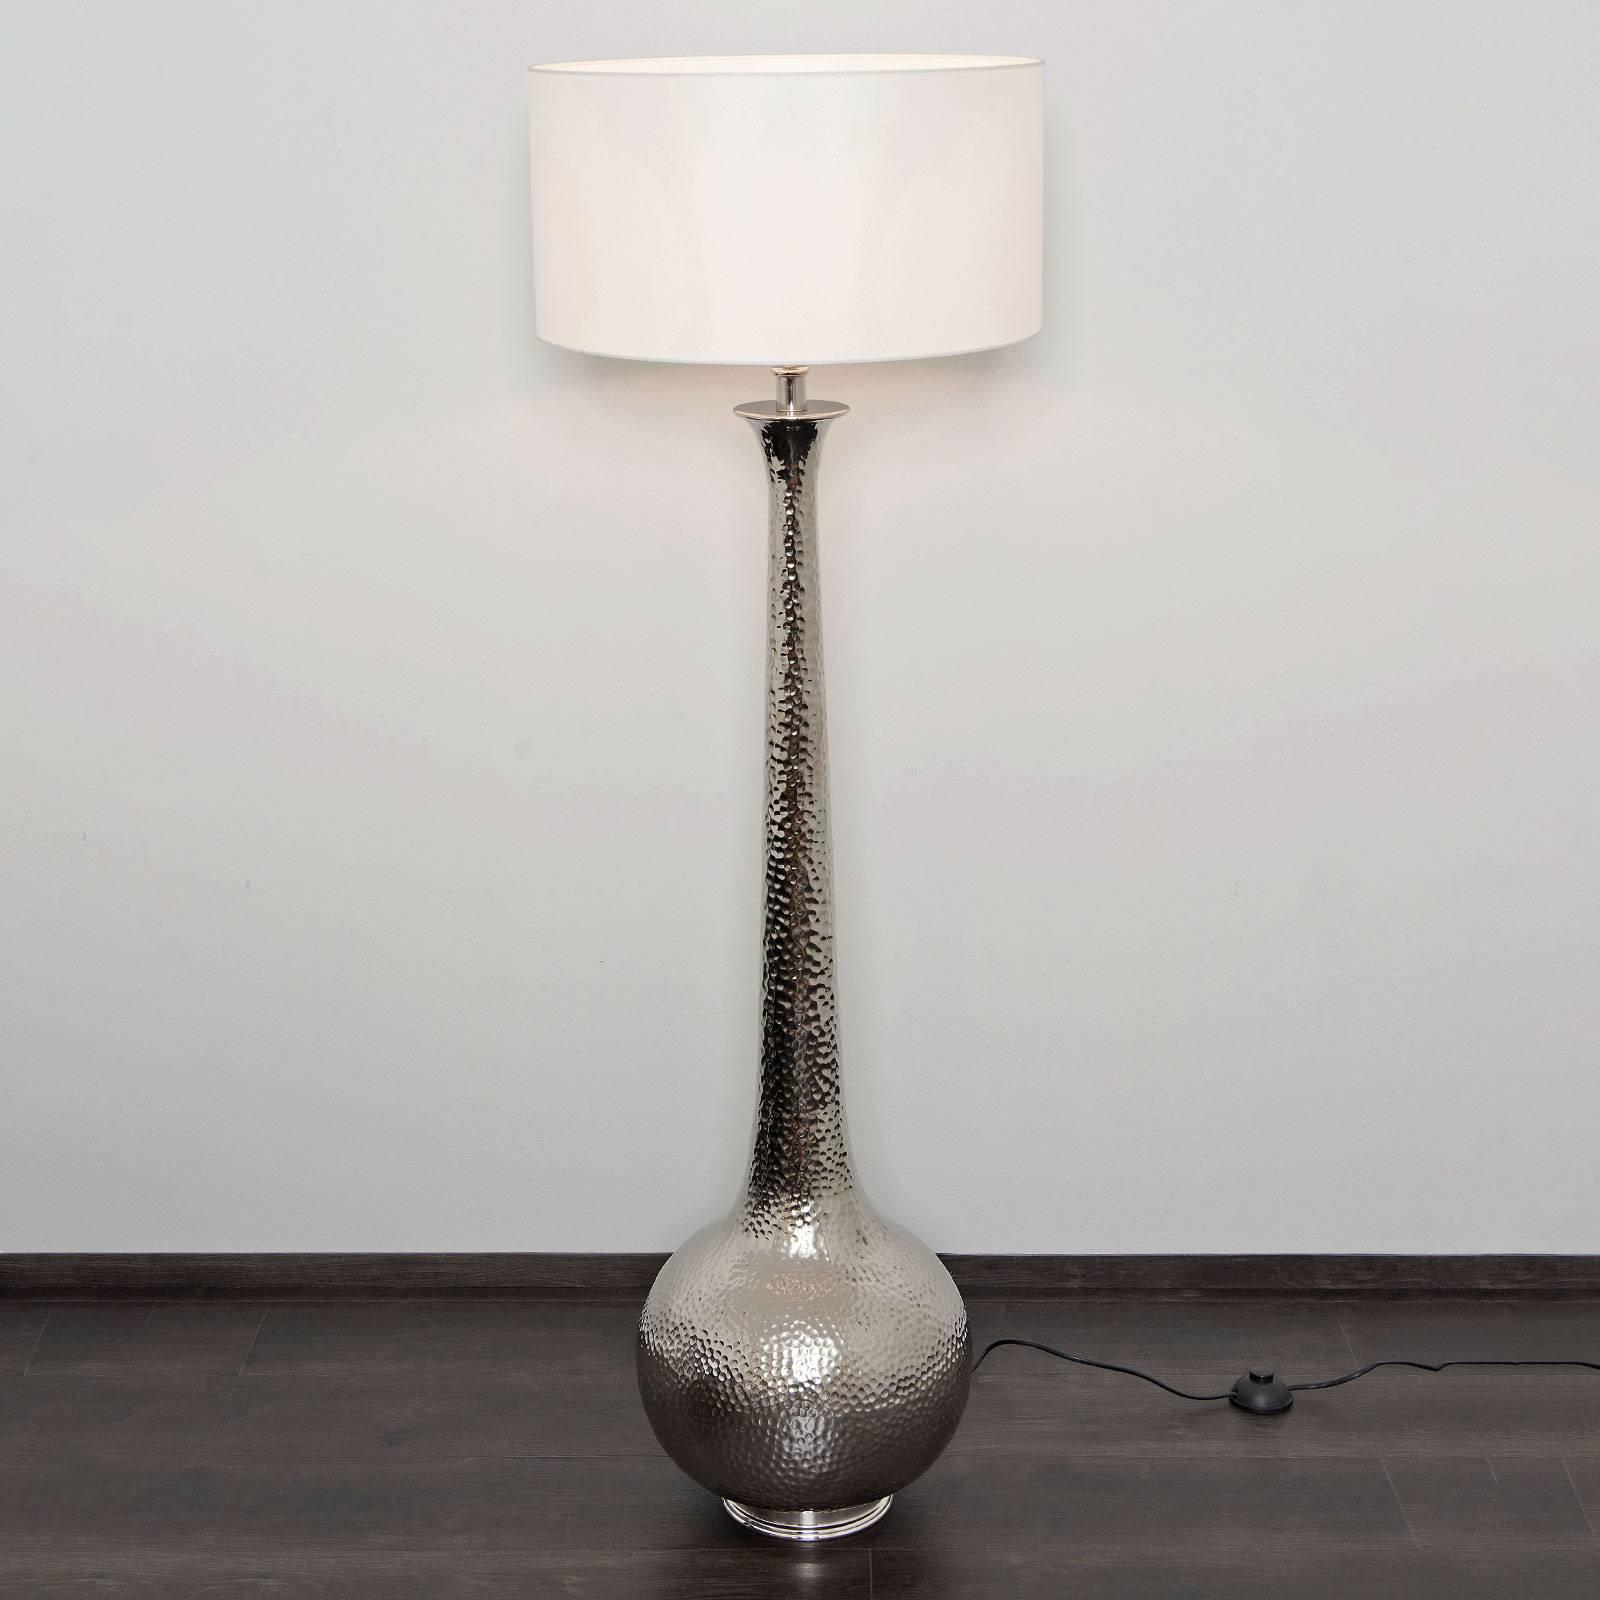 Gulvlampe Maestro, hvit/sølv